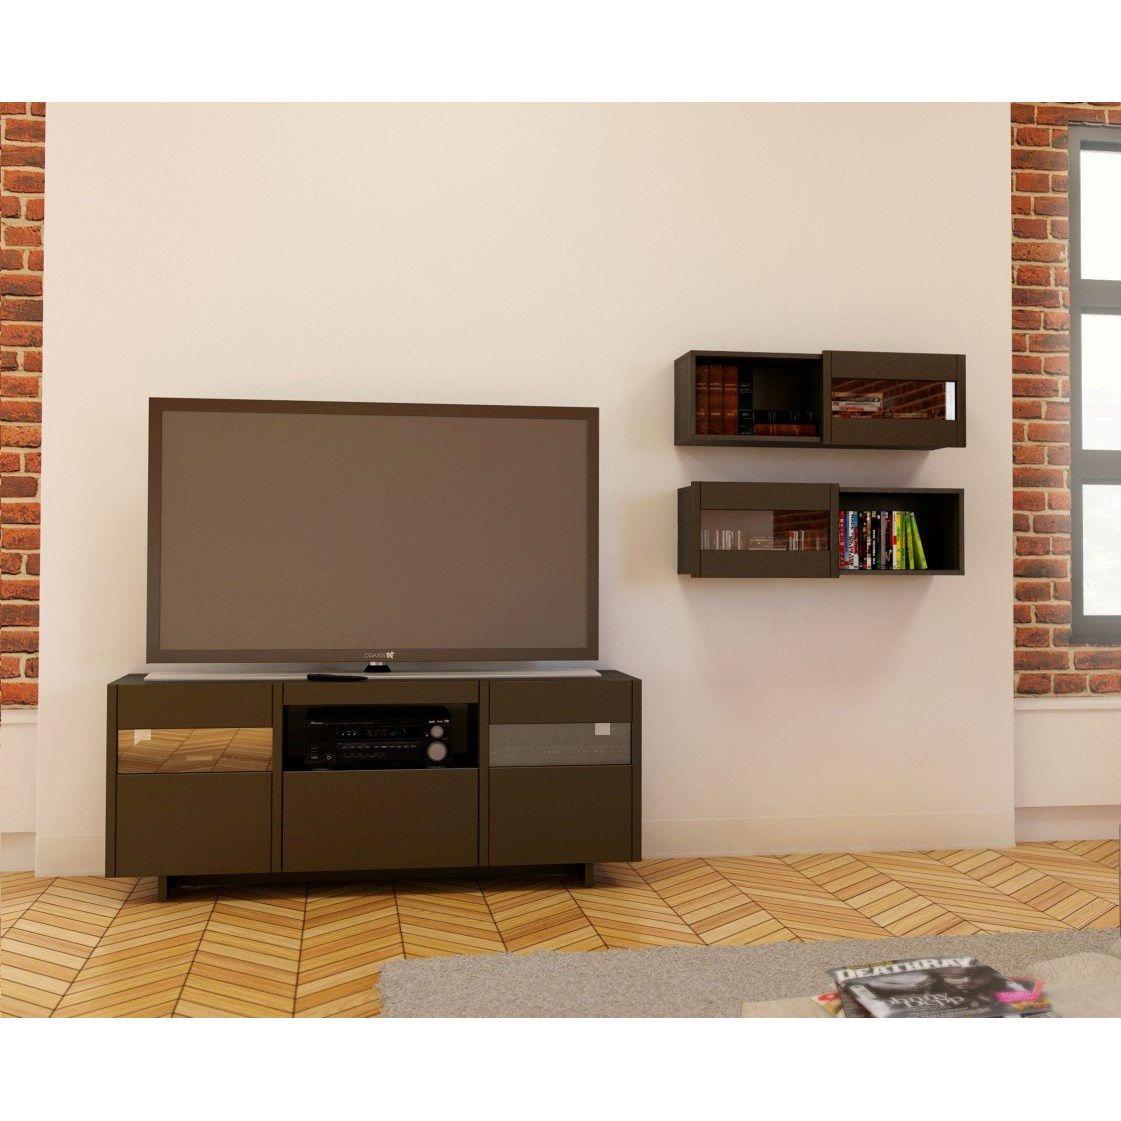 "Nexera 400530 Nuance 60"" TV Stand Kit"